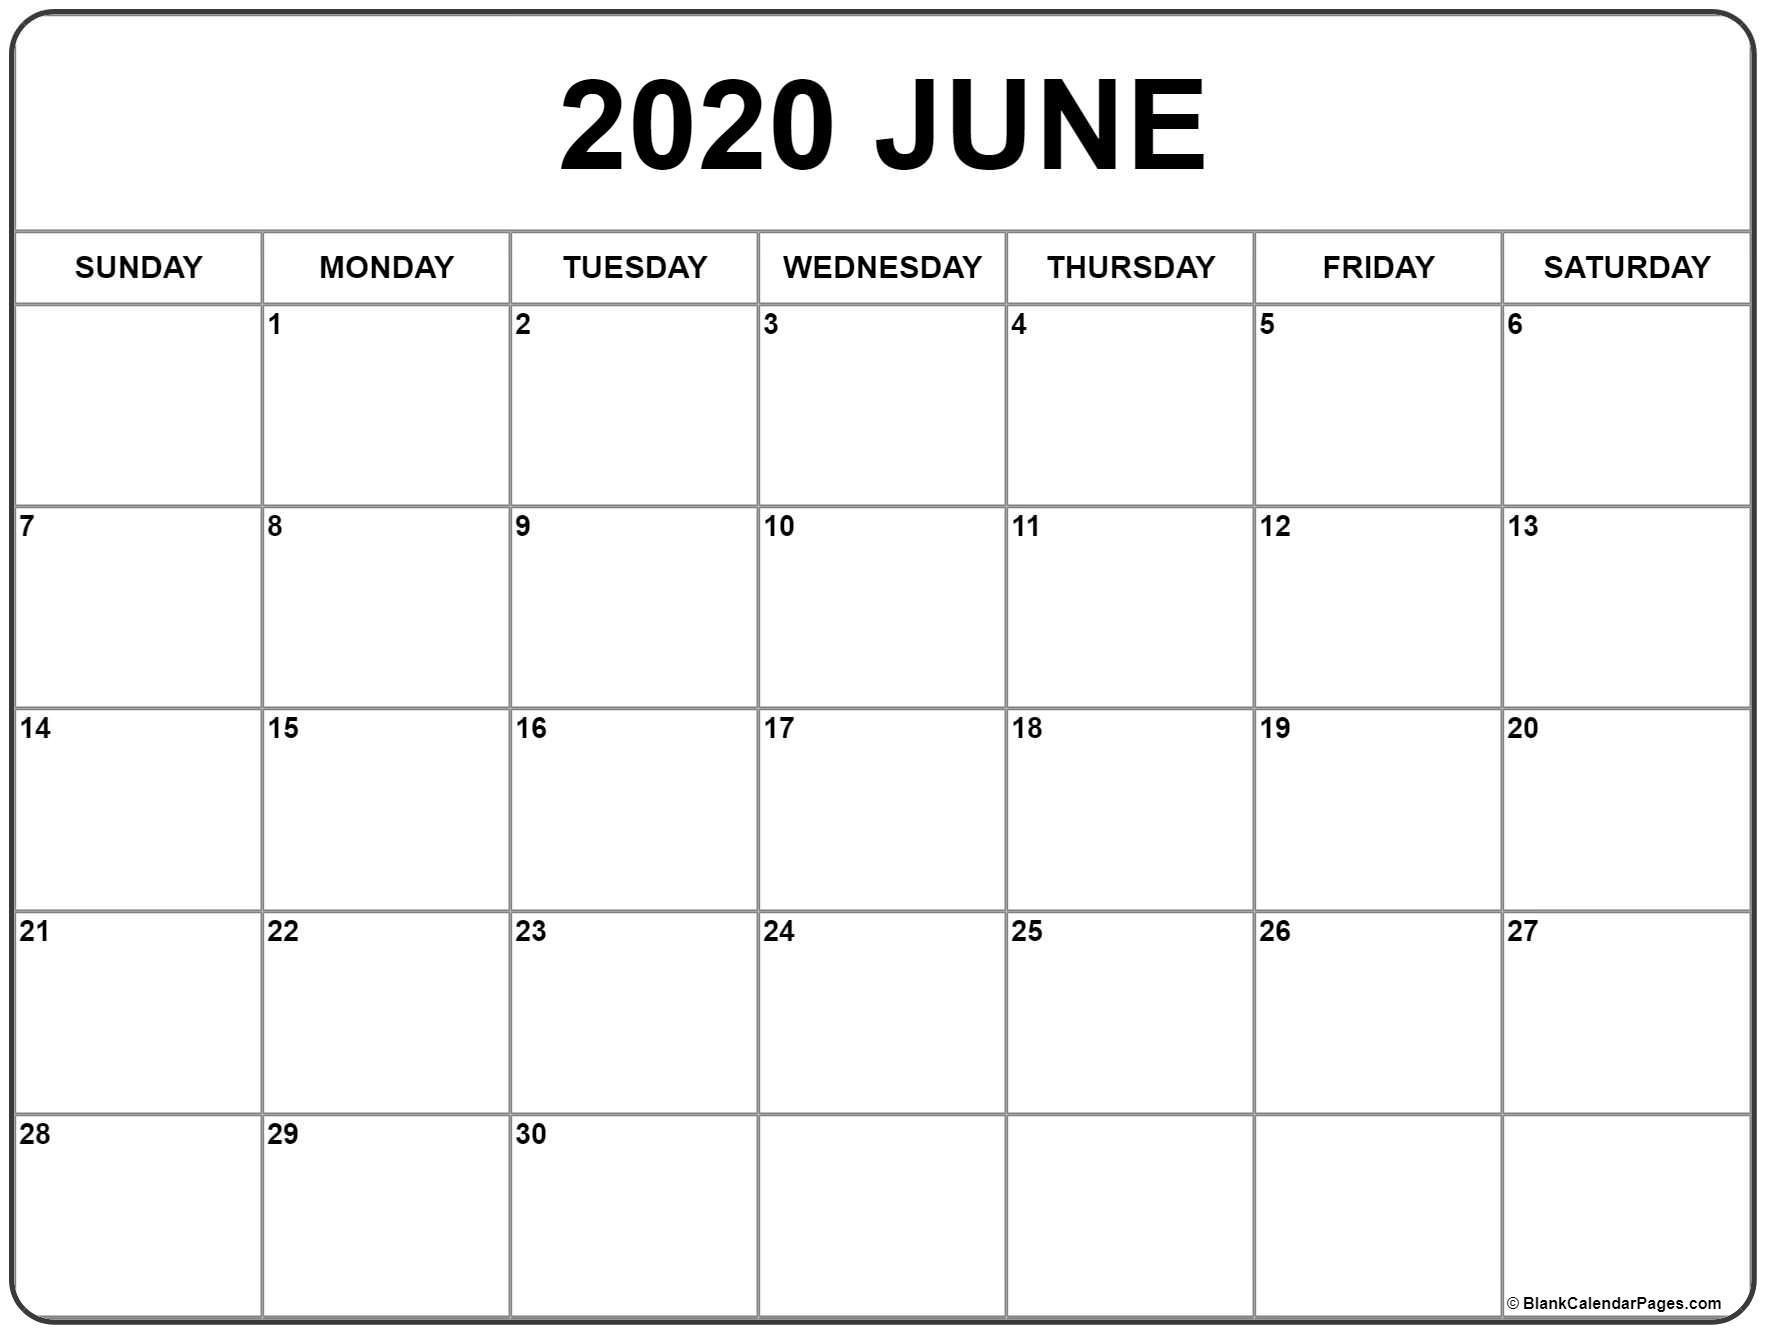 June 2020 Calendar | Free Printable Monthly Calendars-Printable Calendar 2020 Monthly June And July